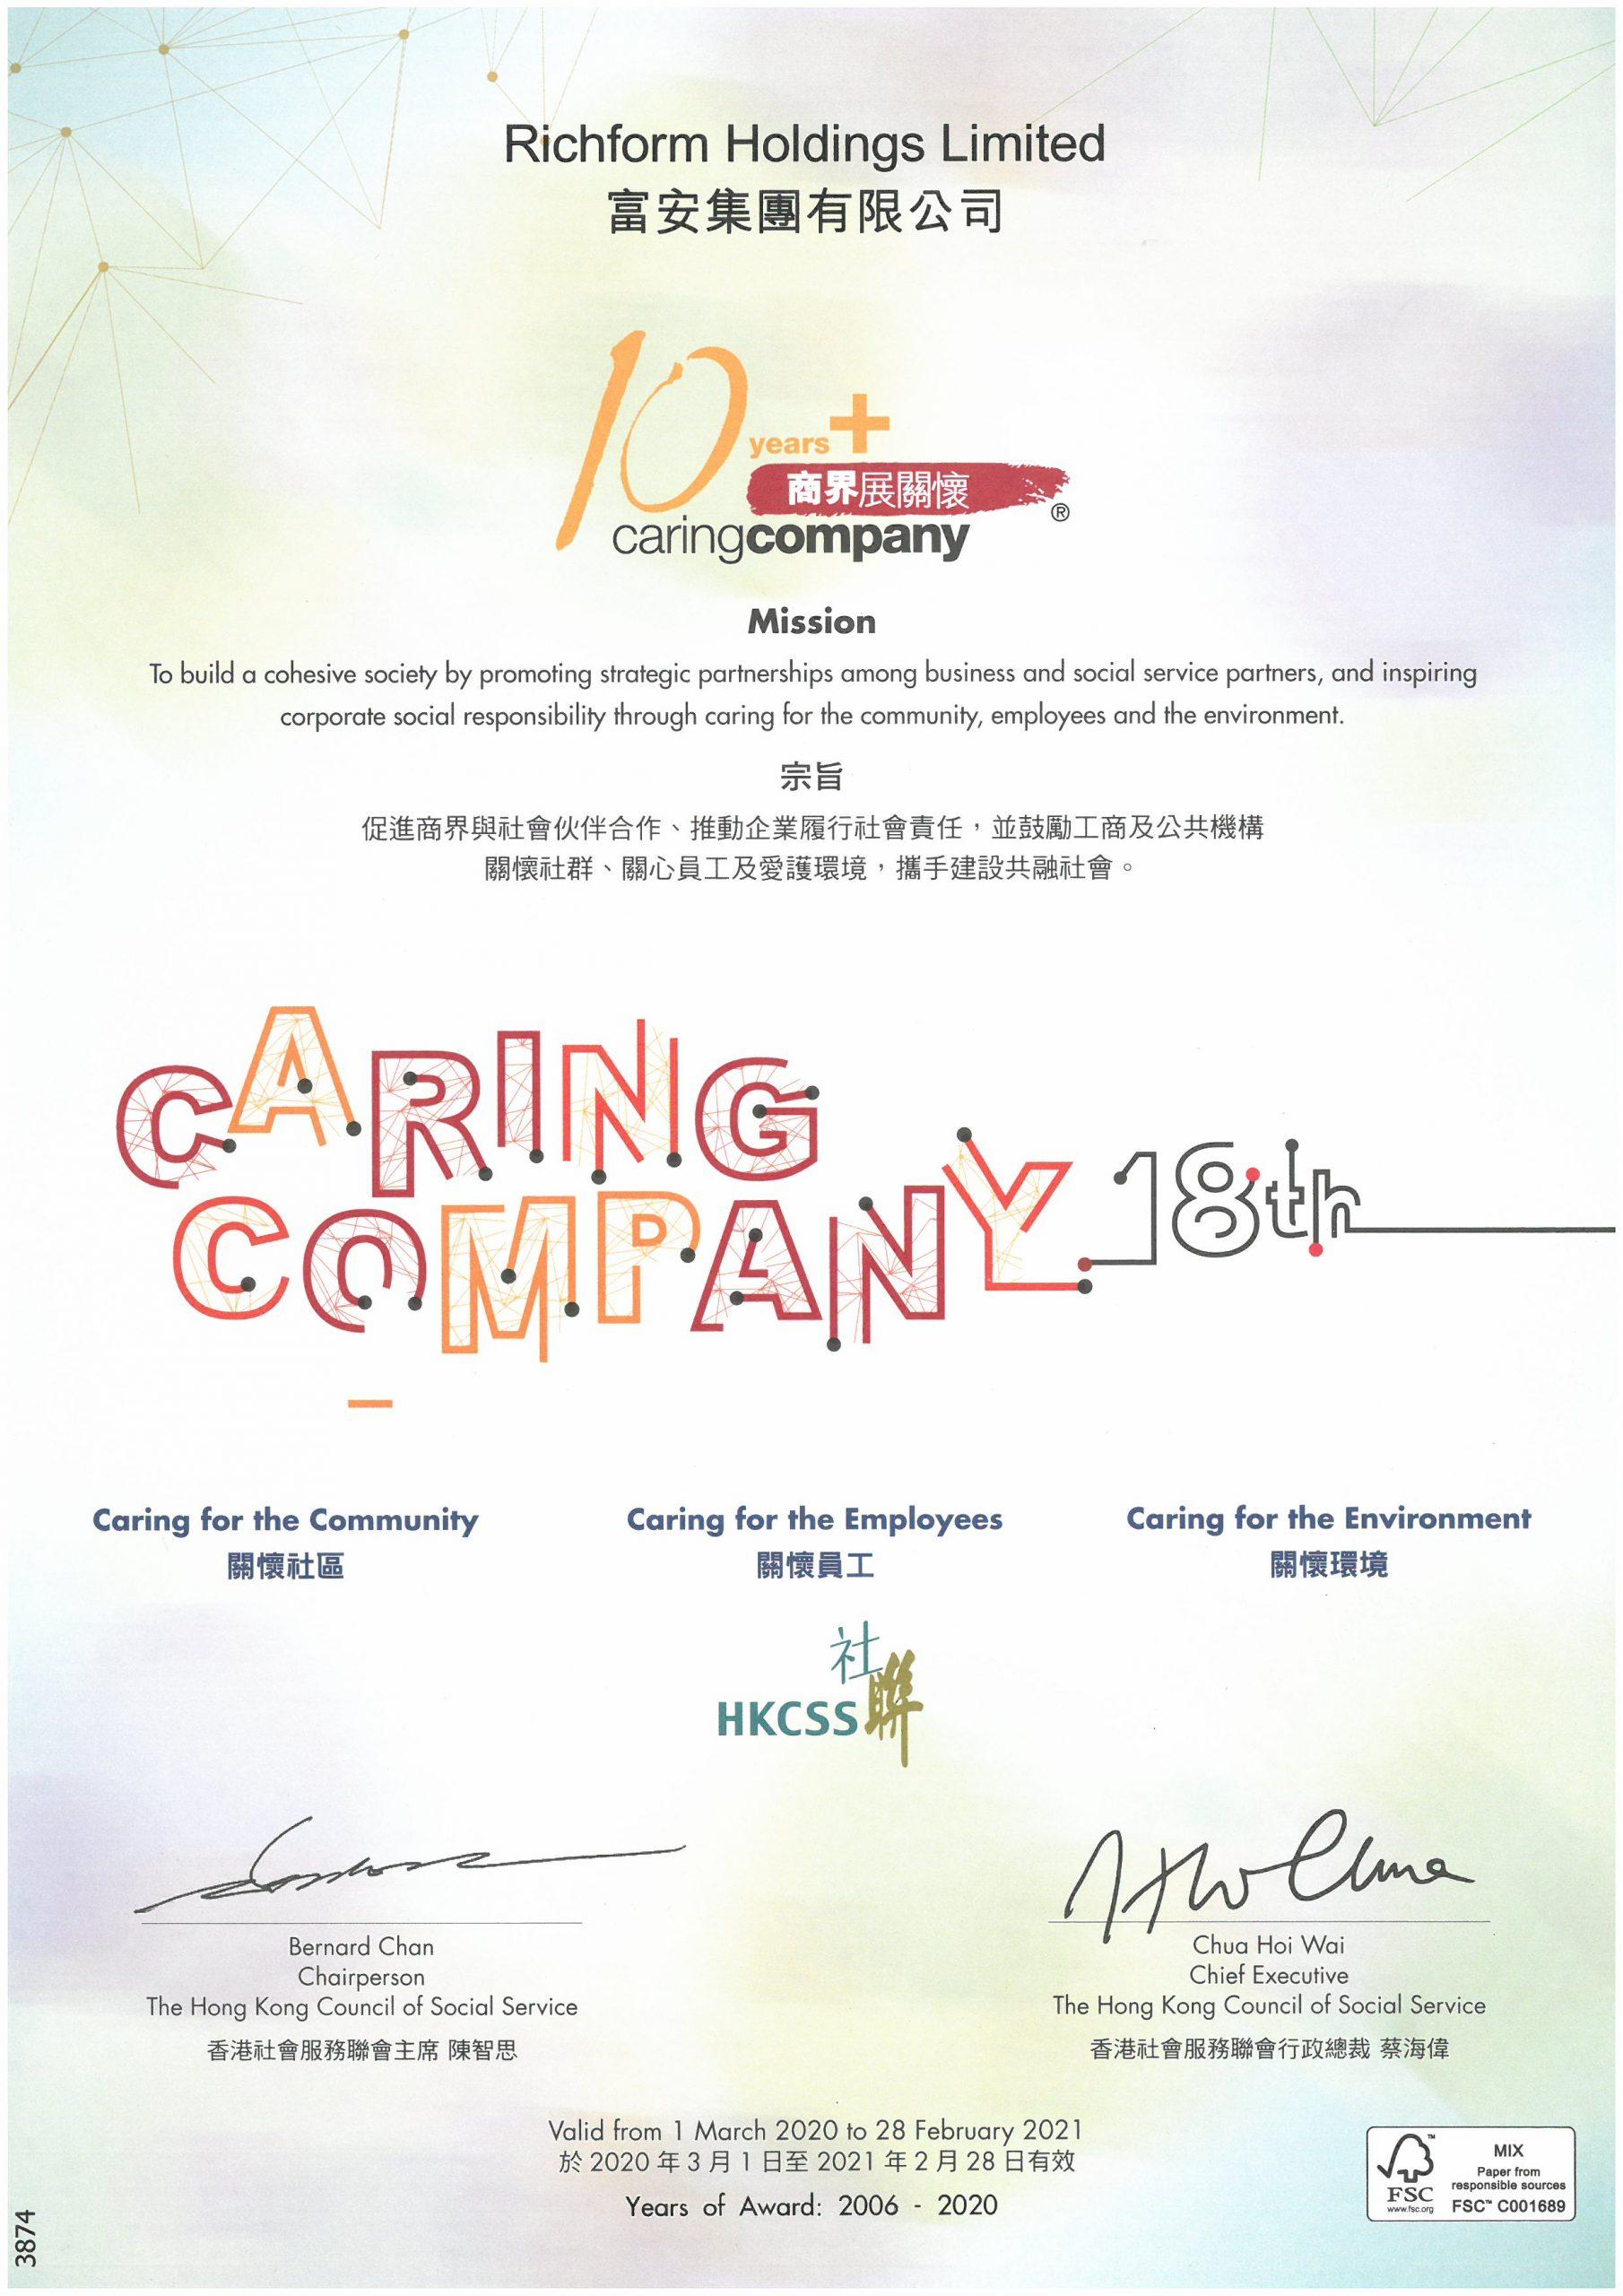 Caring Company 10 years + award